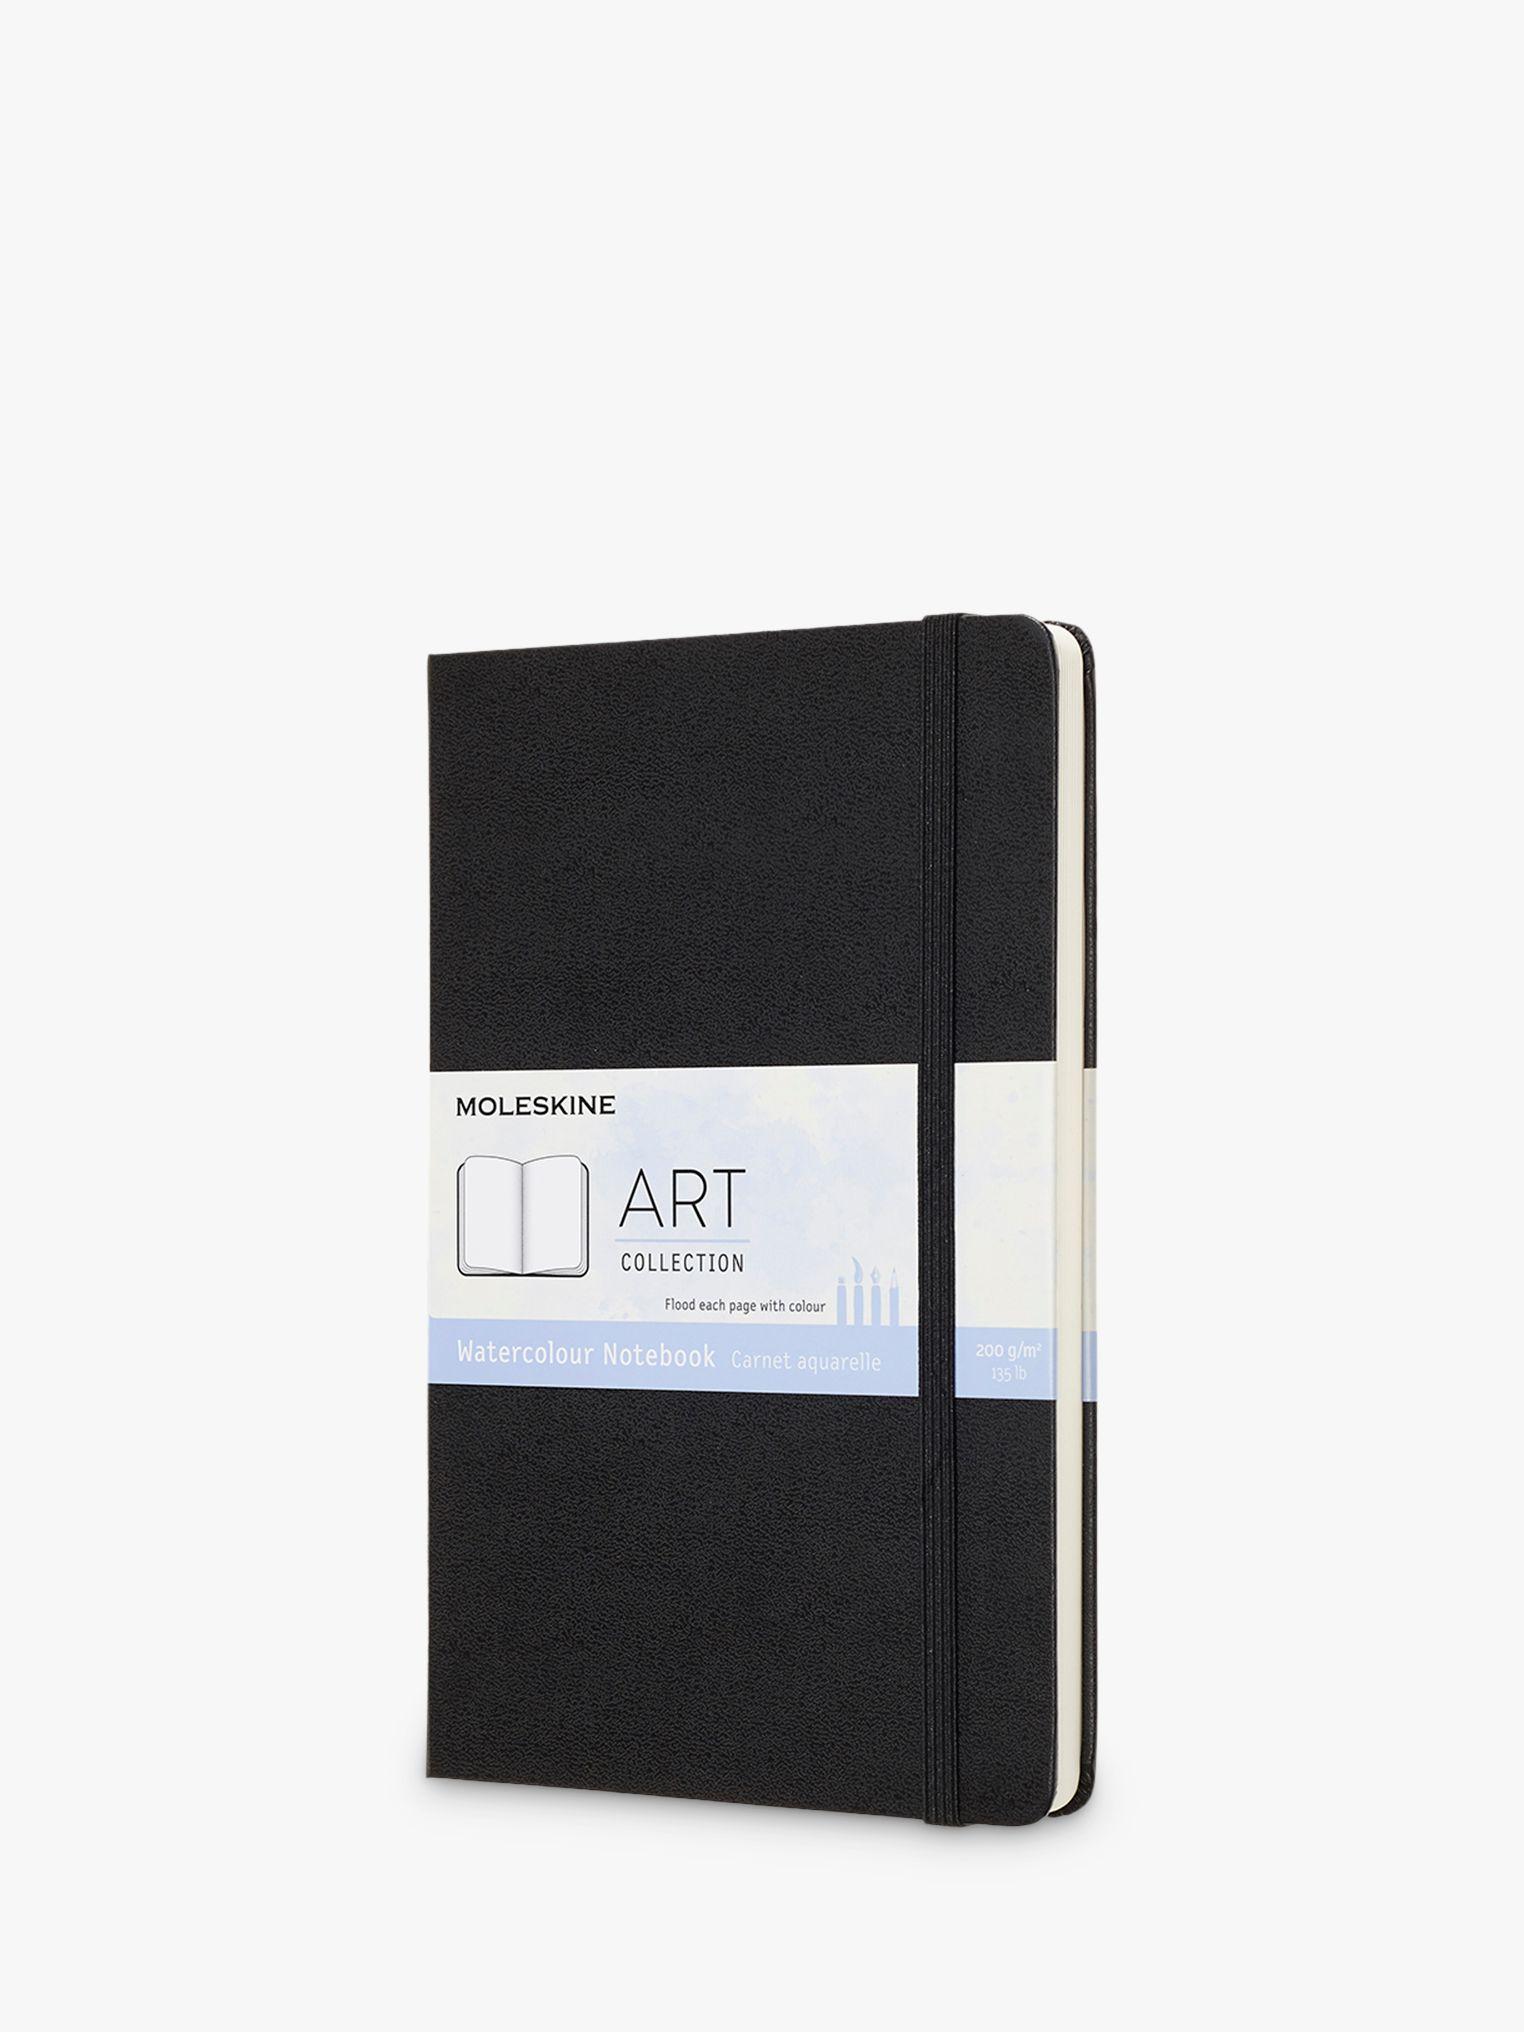 Moleskine Moleskine Large Art Watercolour Sketchbook, Black